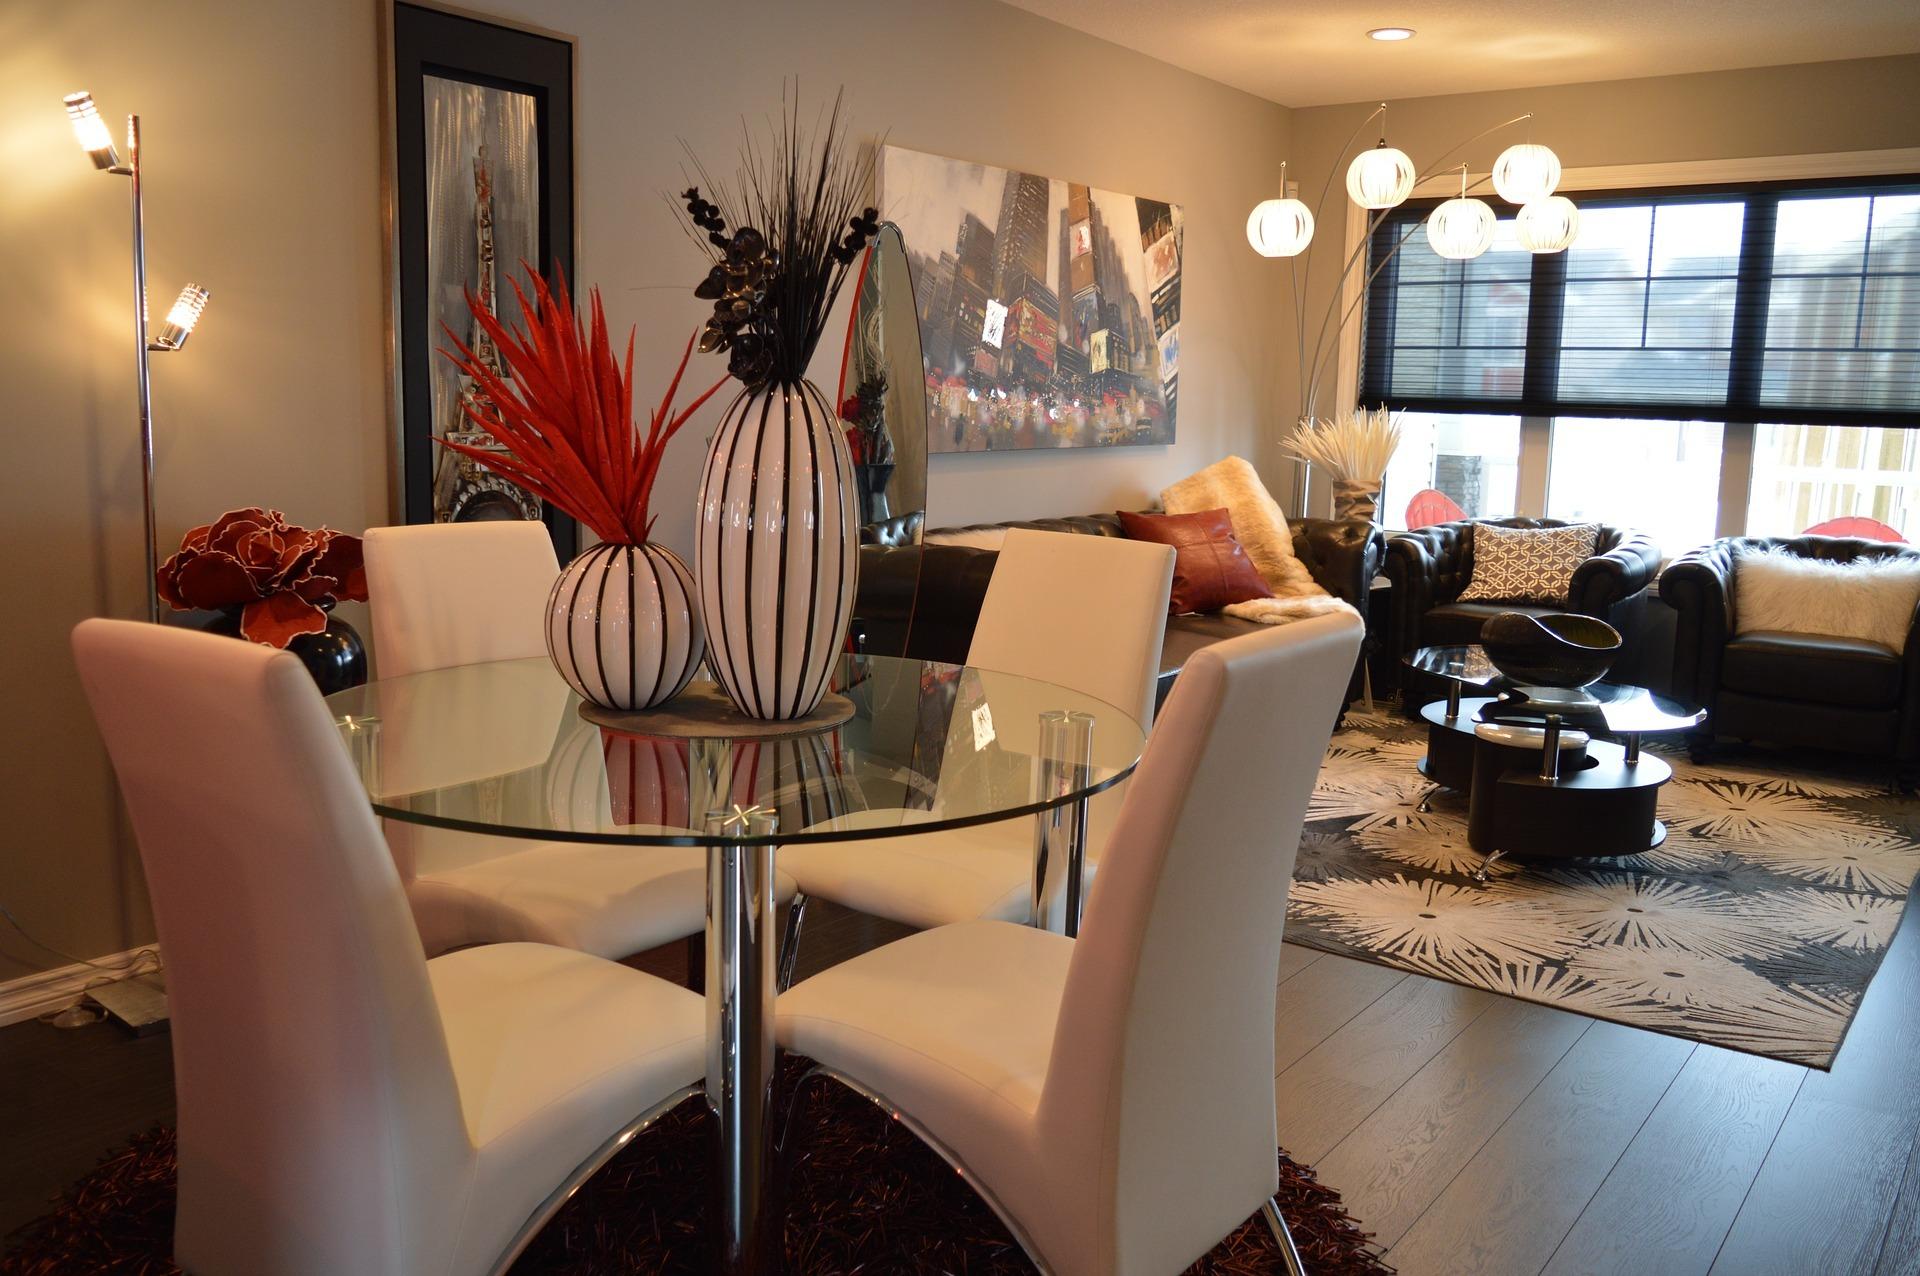 Tips Menyiasati Ruang Makan Mungil Rumah Dan Gaya Hidup Rumahcom